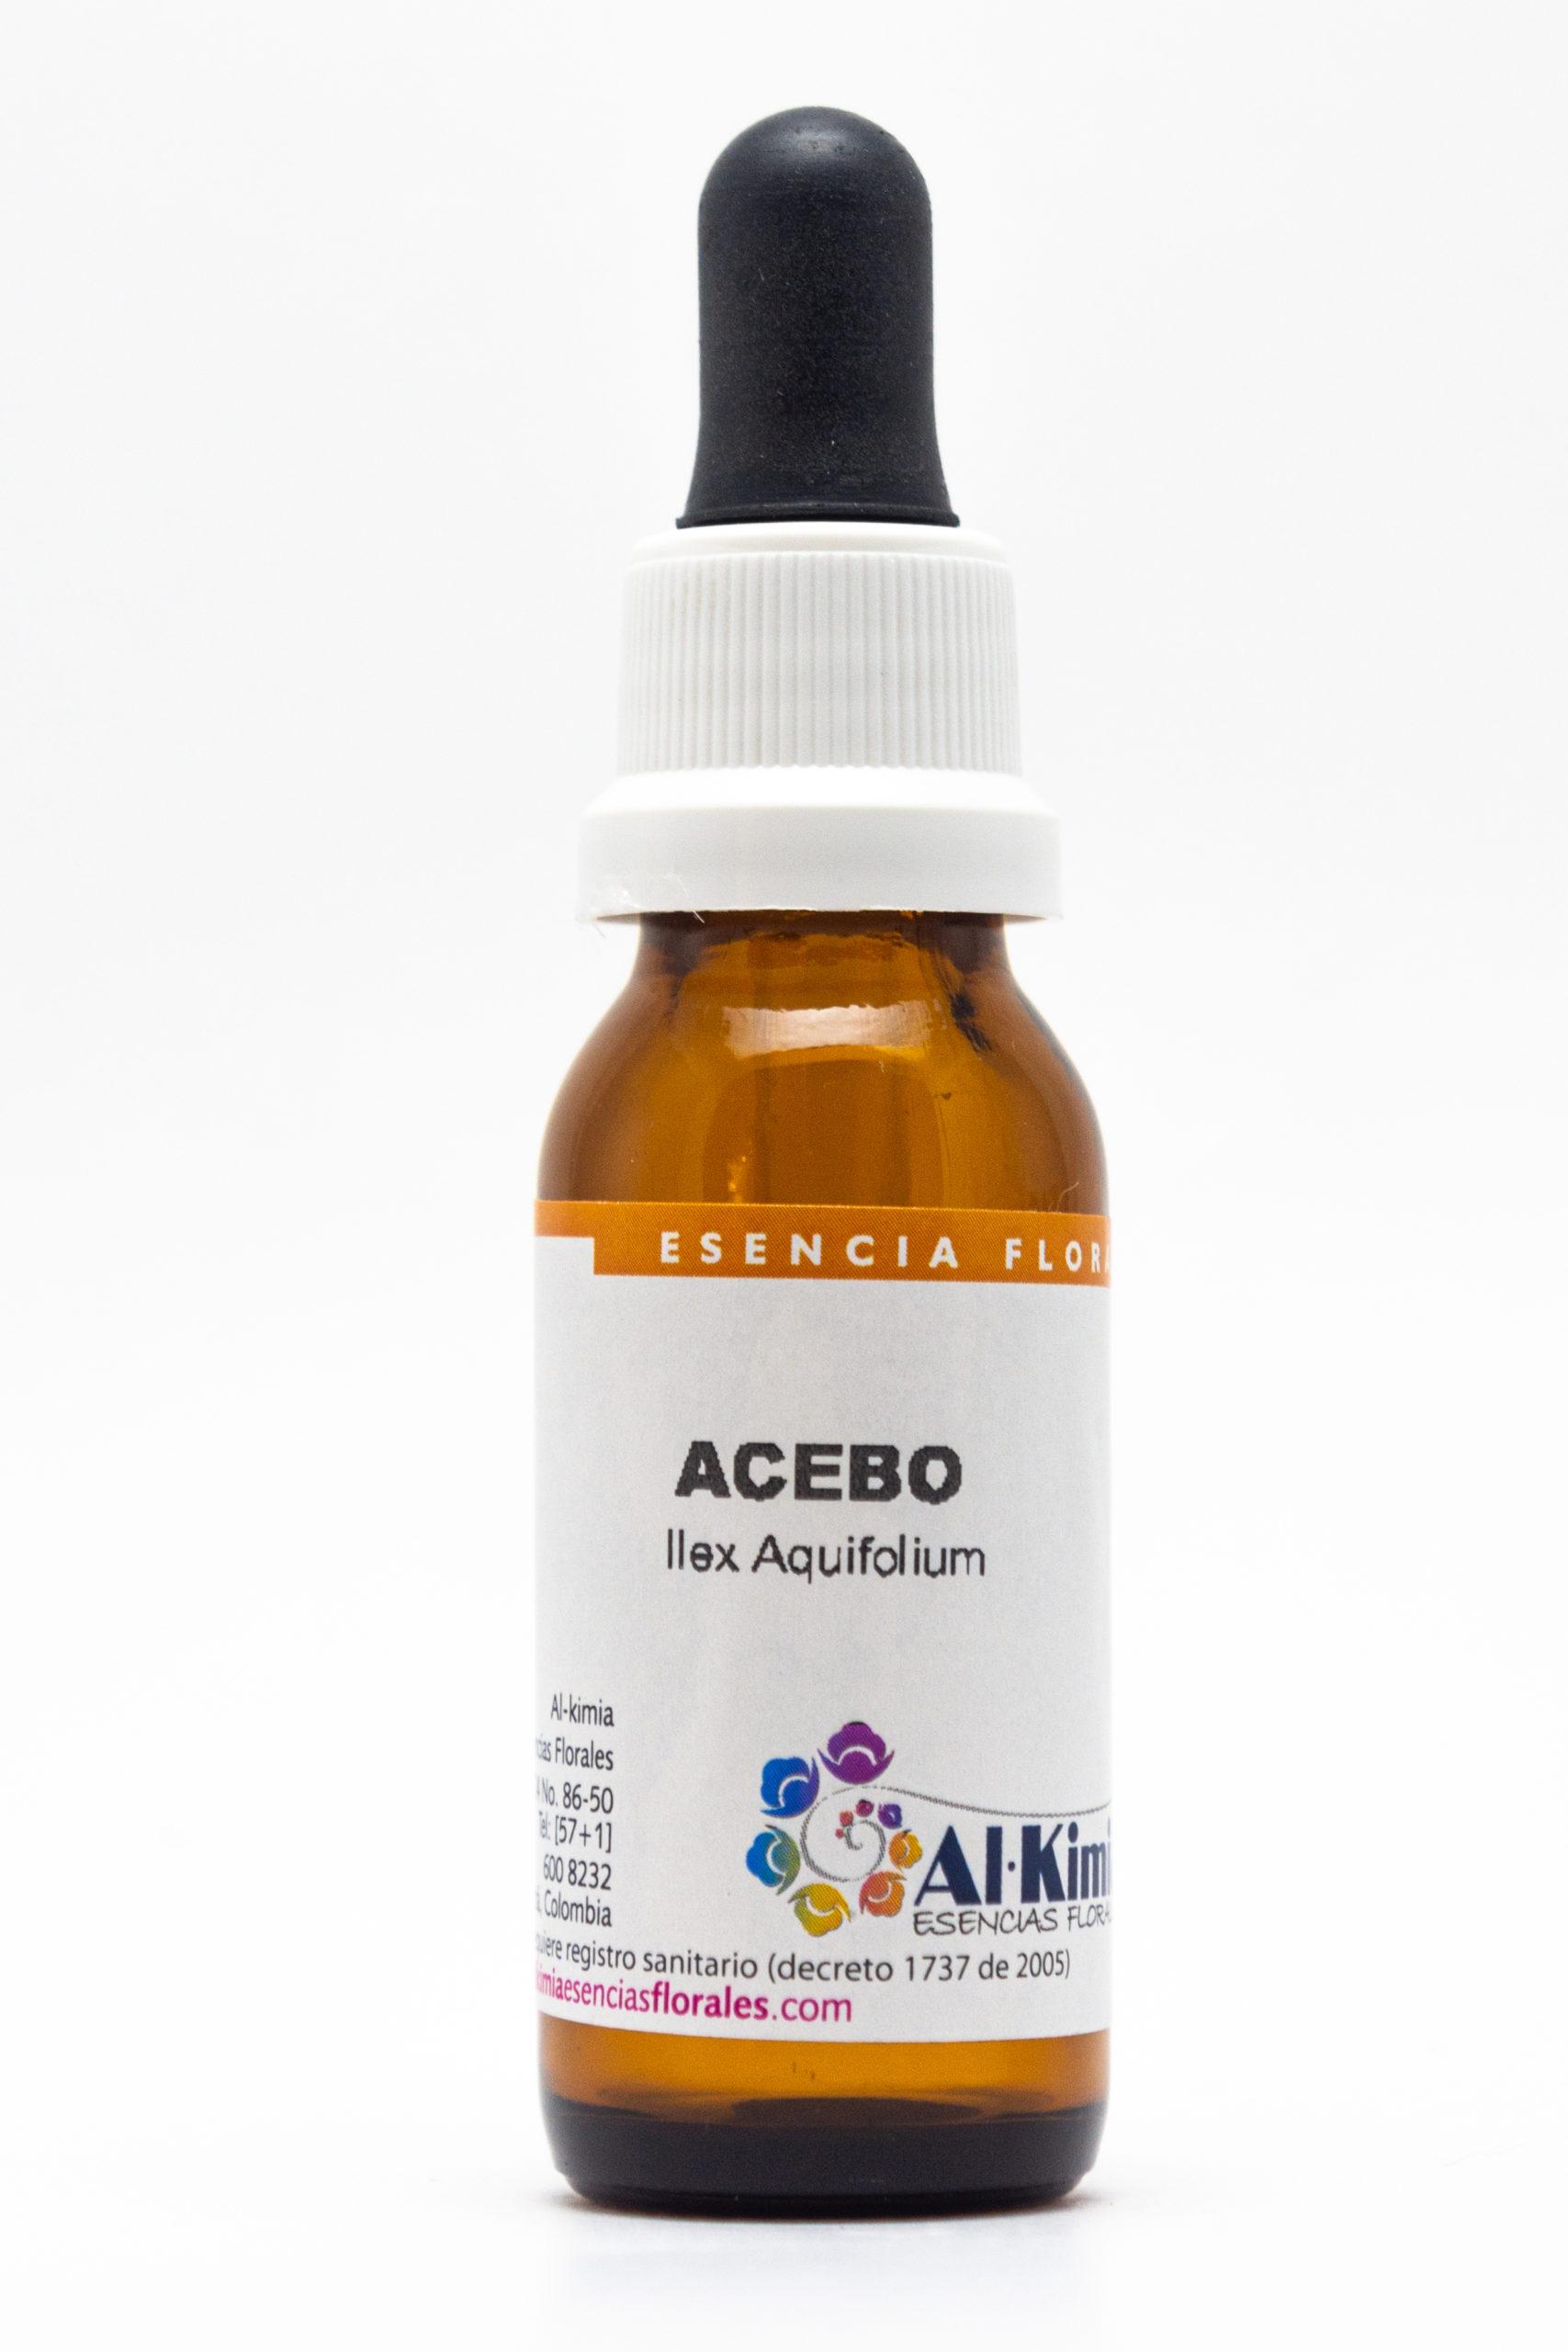 Acebo Botella Stock